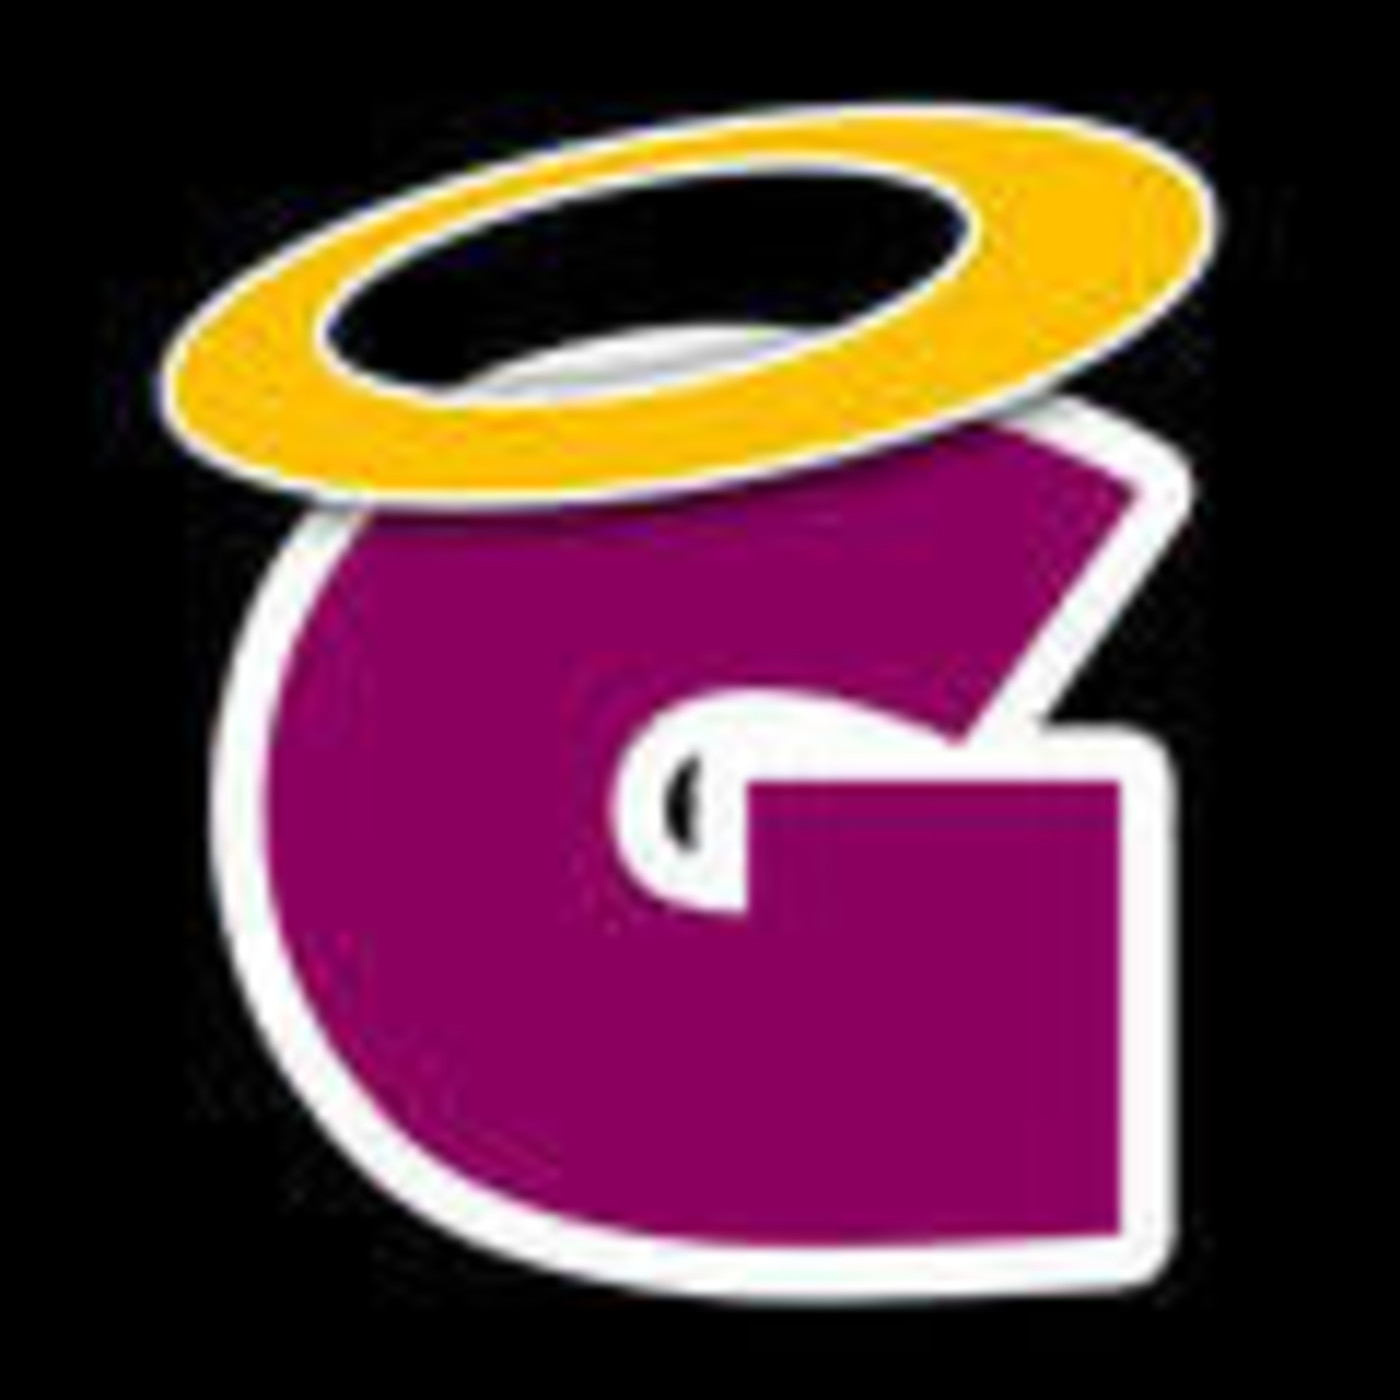 GodisaGeek.com